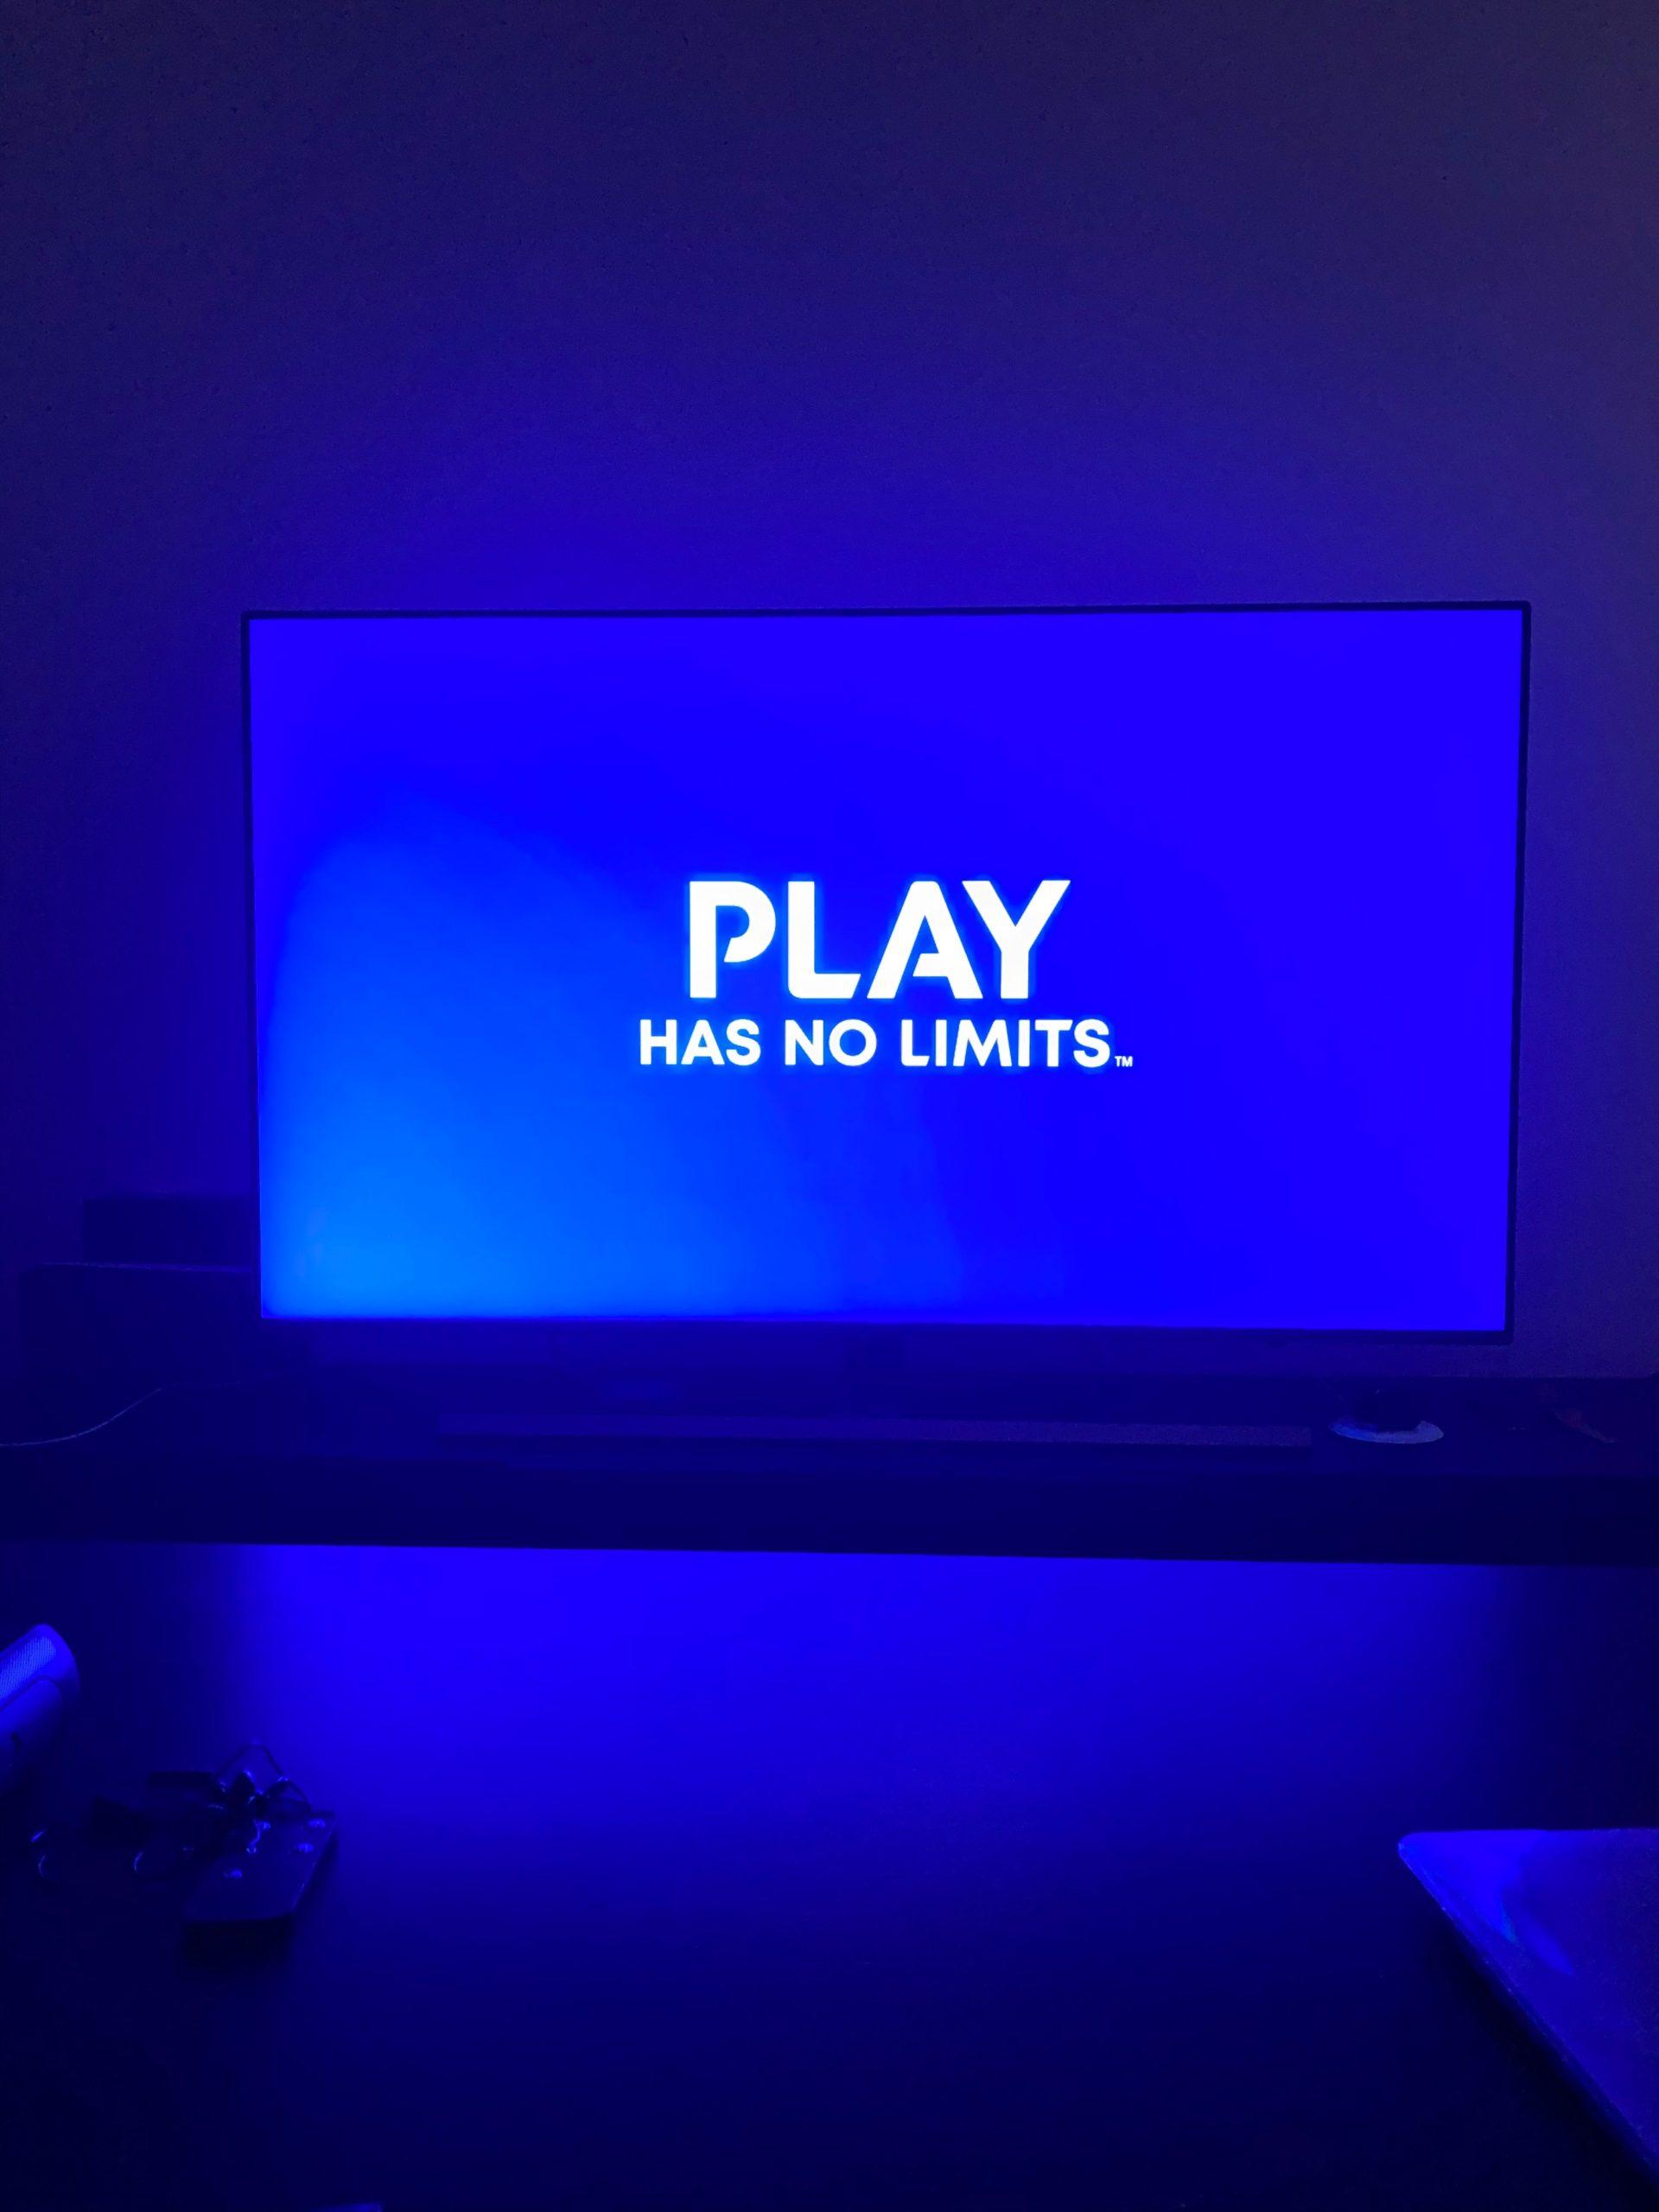 a screen displaying play has no limits